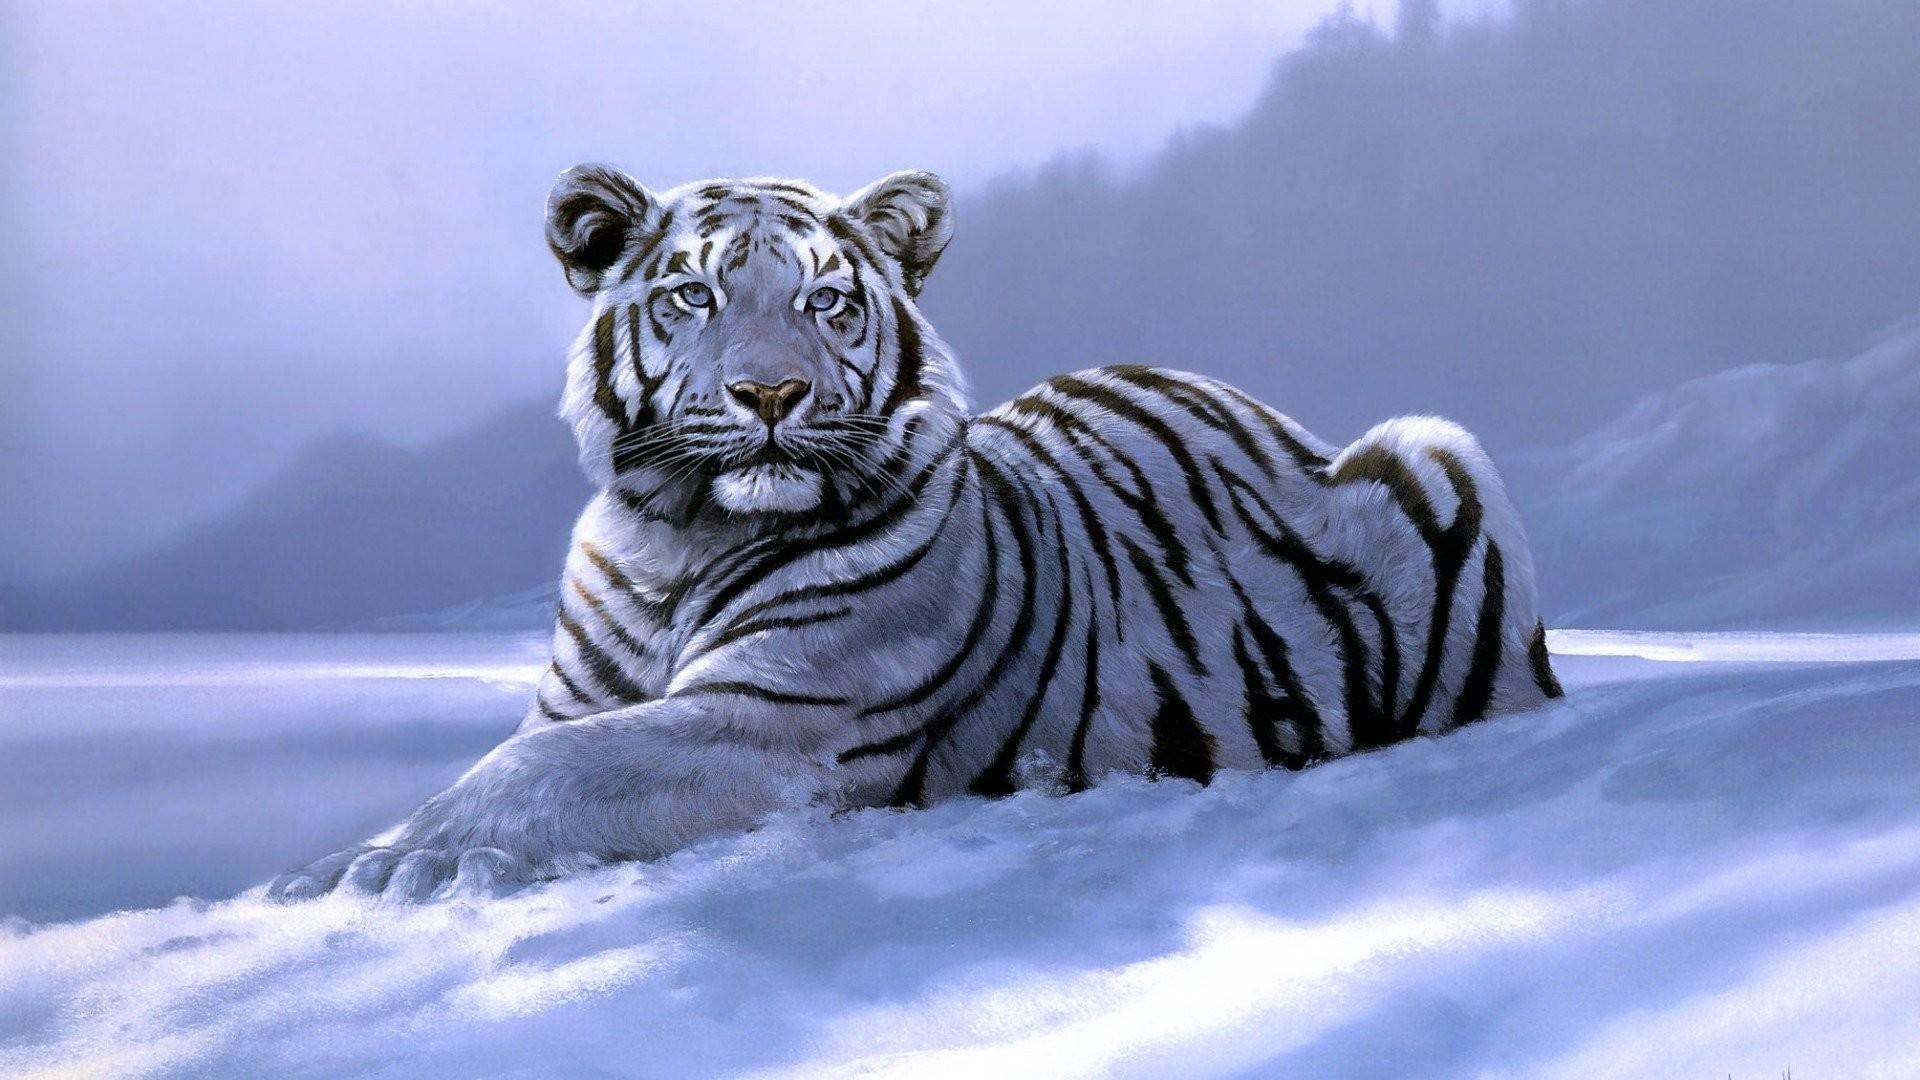 Winter Tag – Tigers Big Wild Tiger Laying Wintertime Cat Winter Siberian  Art Snow Fantasy White